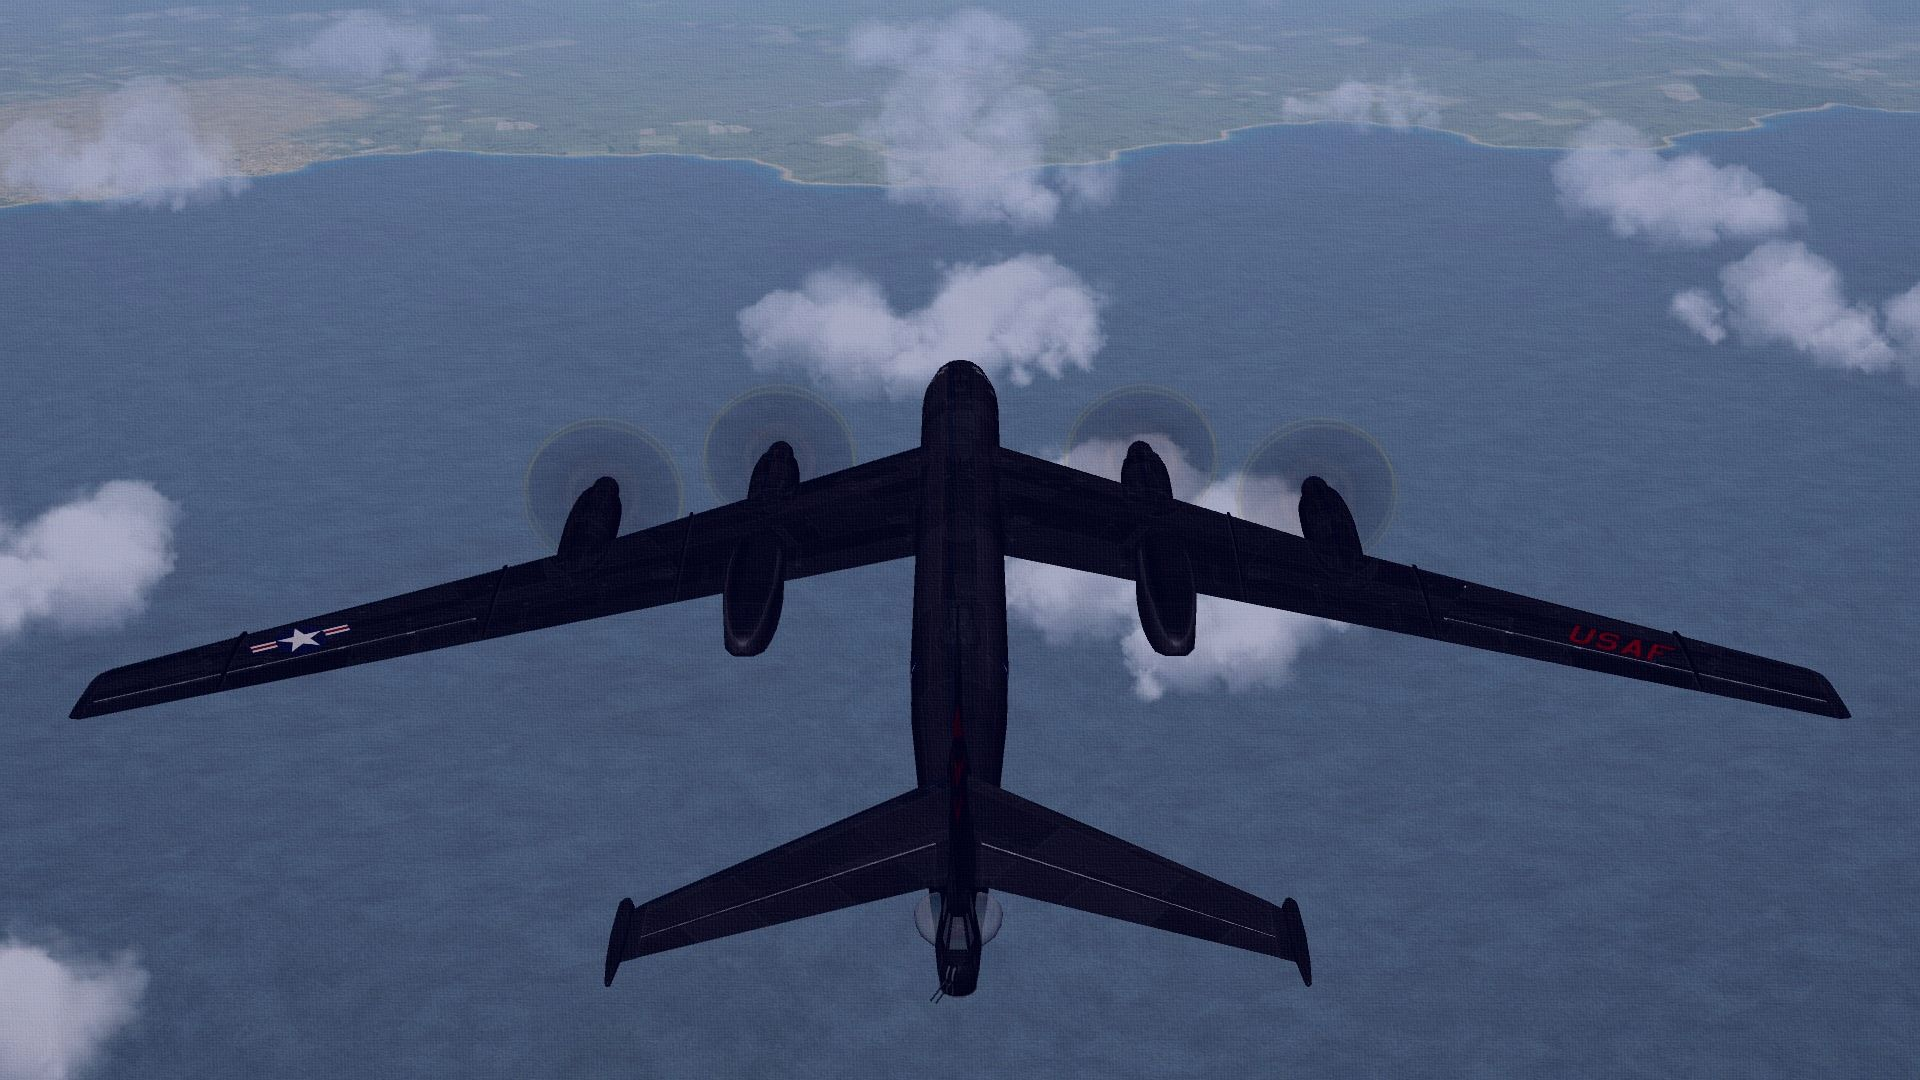 USAAFB-38BSTRATOBOMBER04_zps8dcc7dc2.jpg